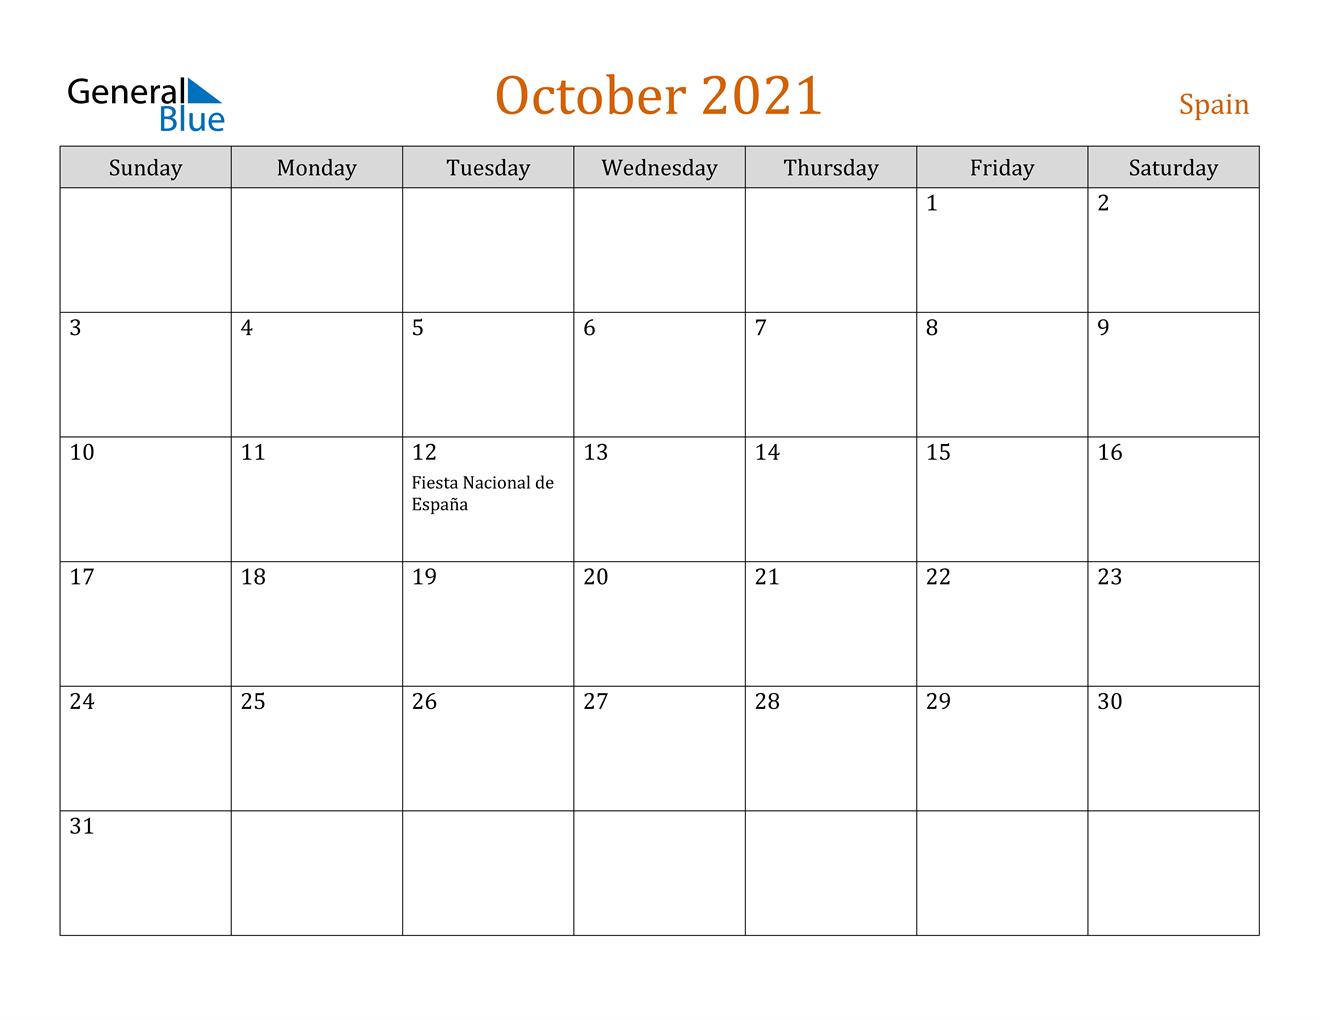 October 2021 Calendar - Spain